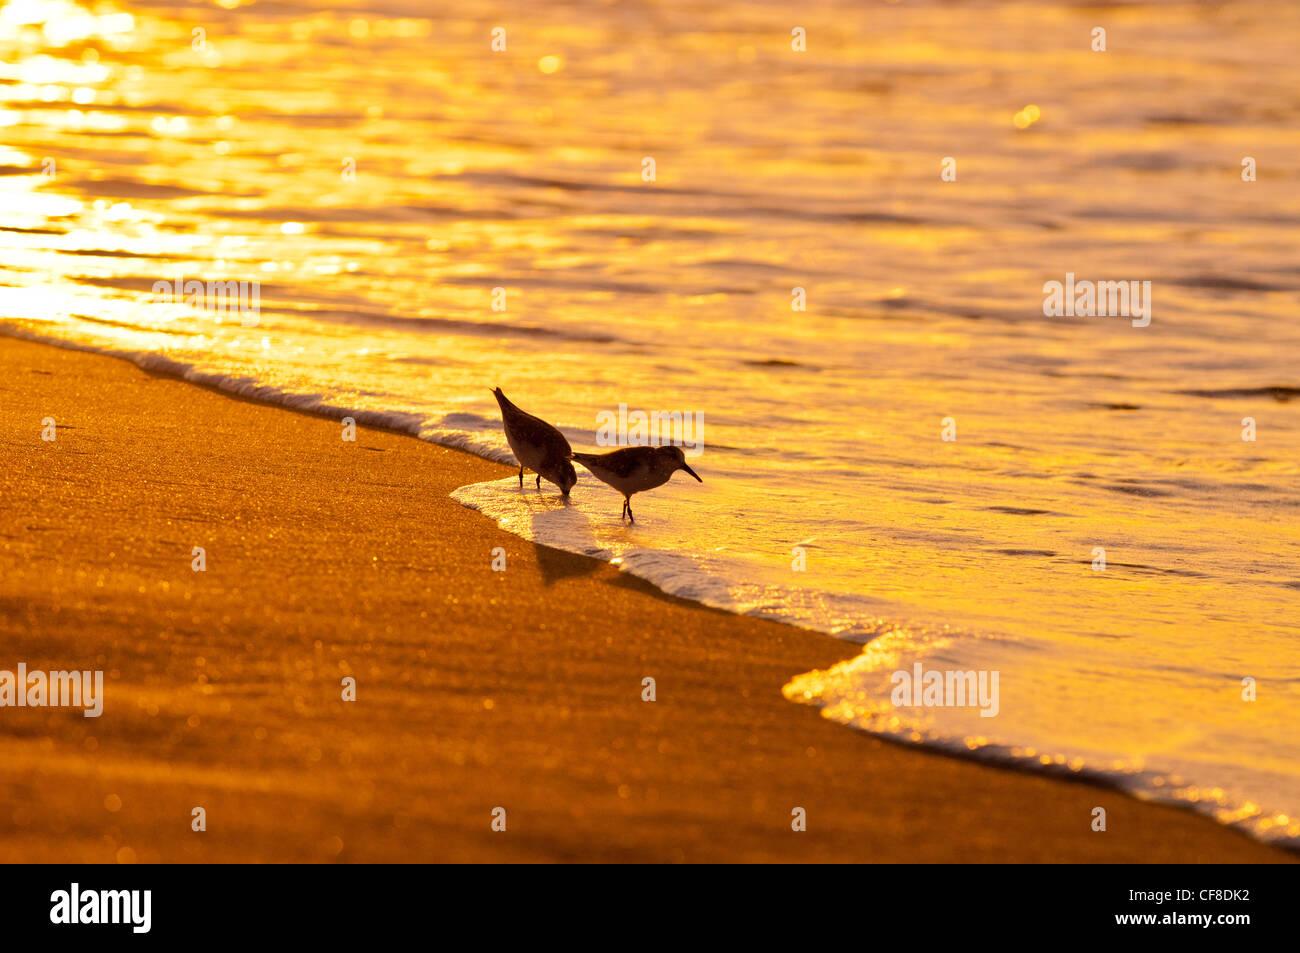 Sanderlings-'Hunakai' in lingua hawaiana (Calidris alba), Spiaggia di Polihale, Kauai, Hawaii Immagini Stock